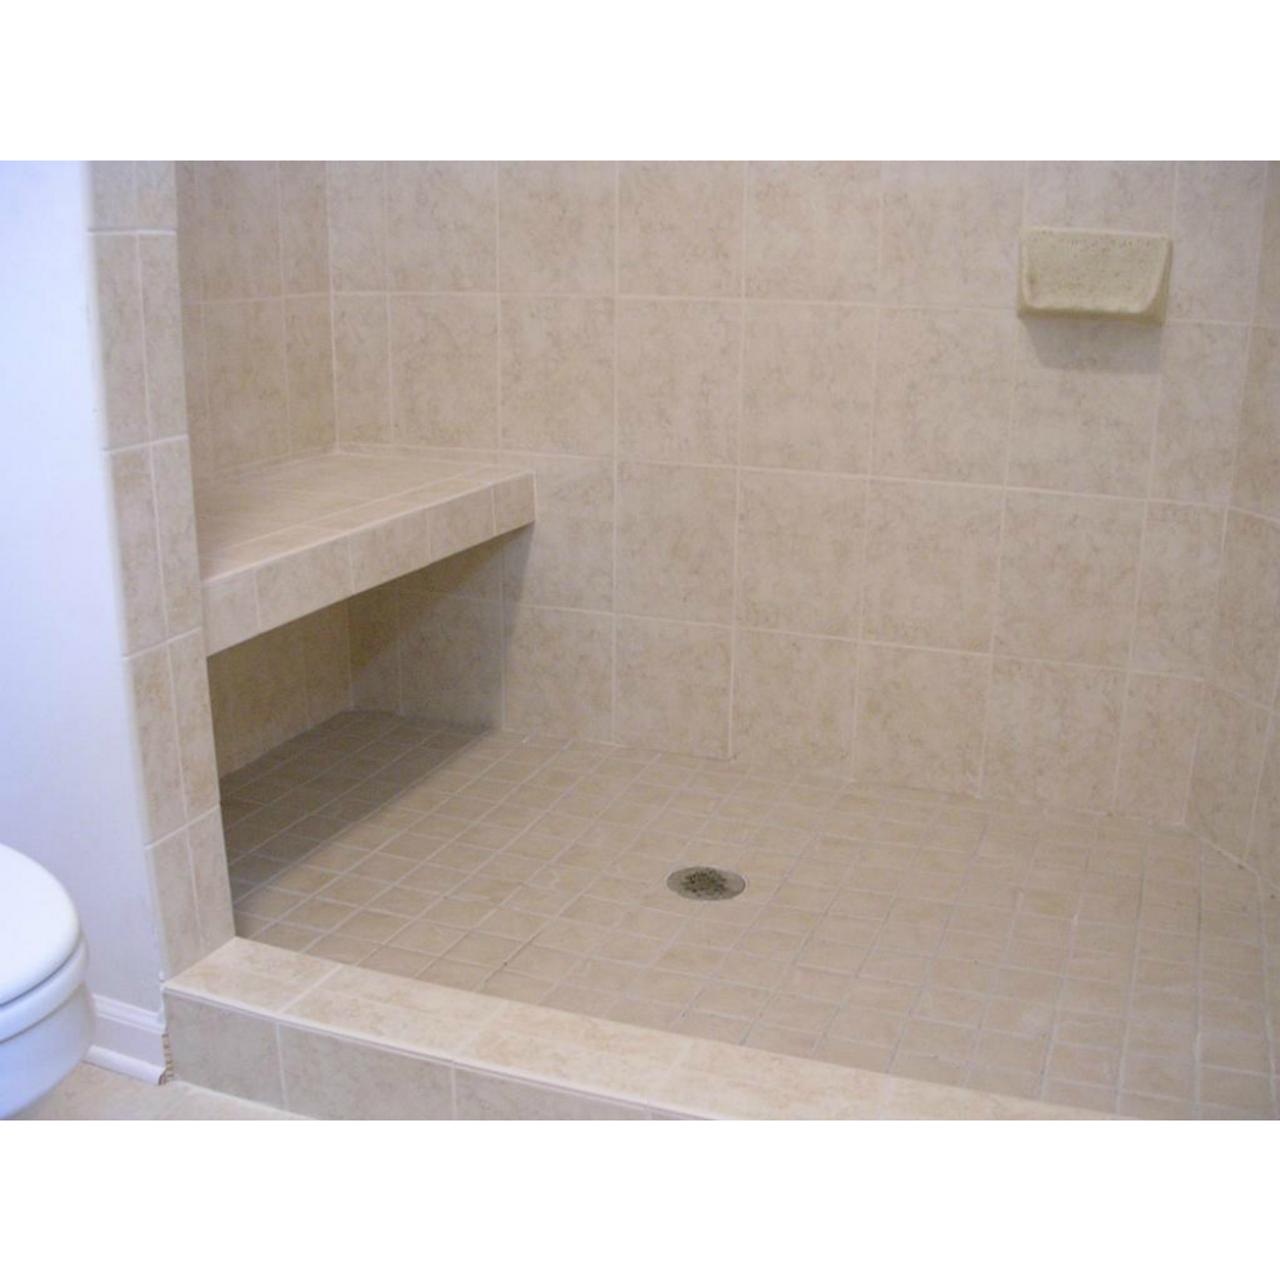 Adjustable Rectangular Bench by Innovis